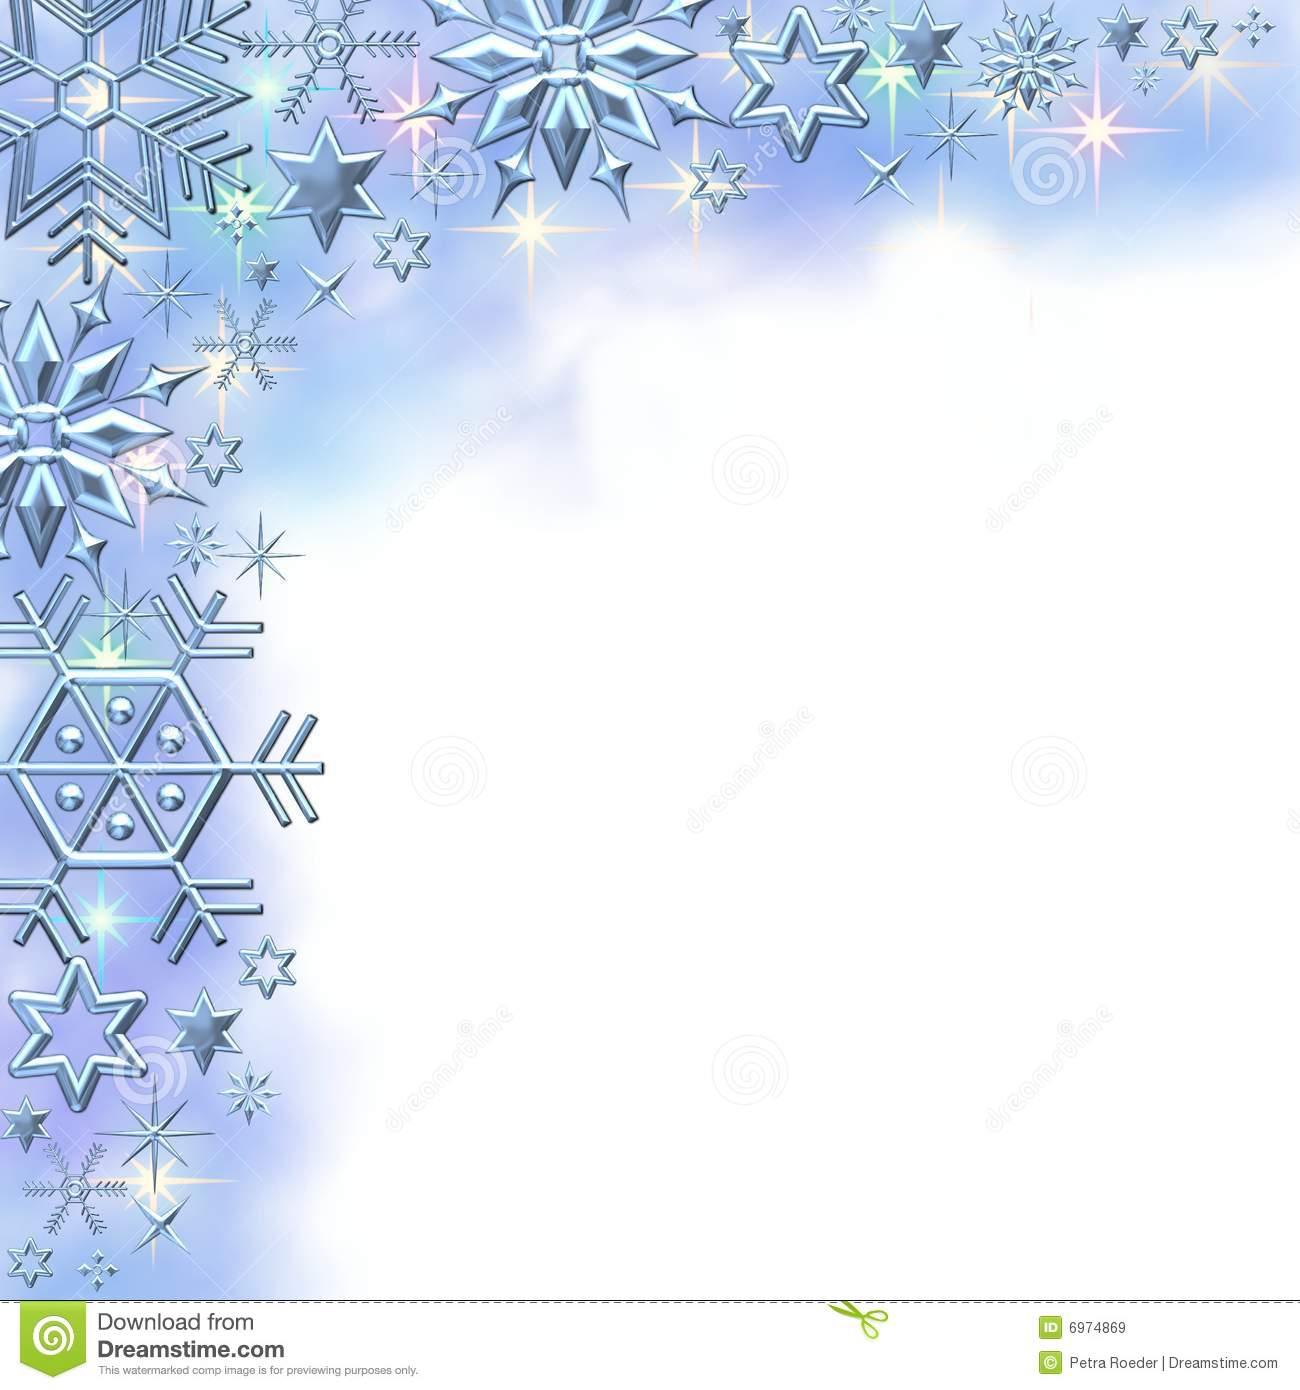 Winter clipart frame Clipart snowflake Snow Clipart Border